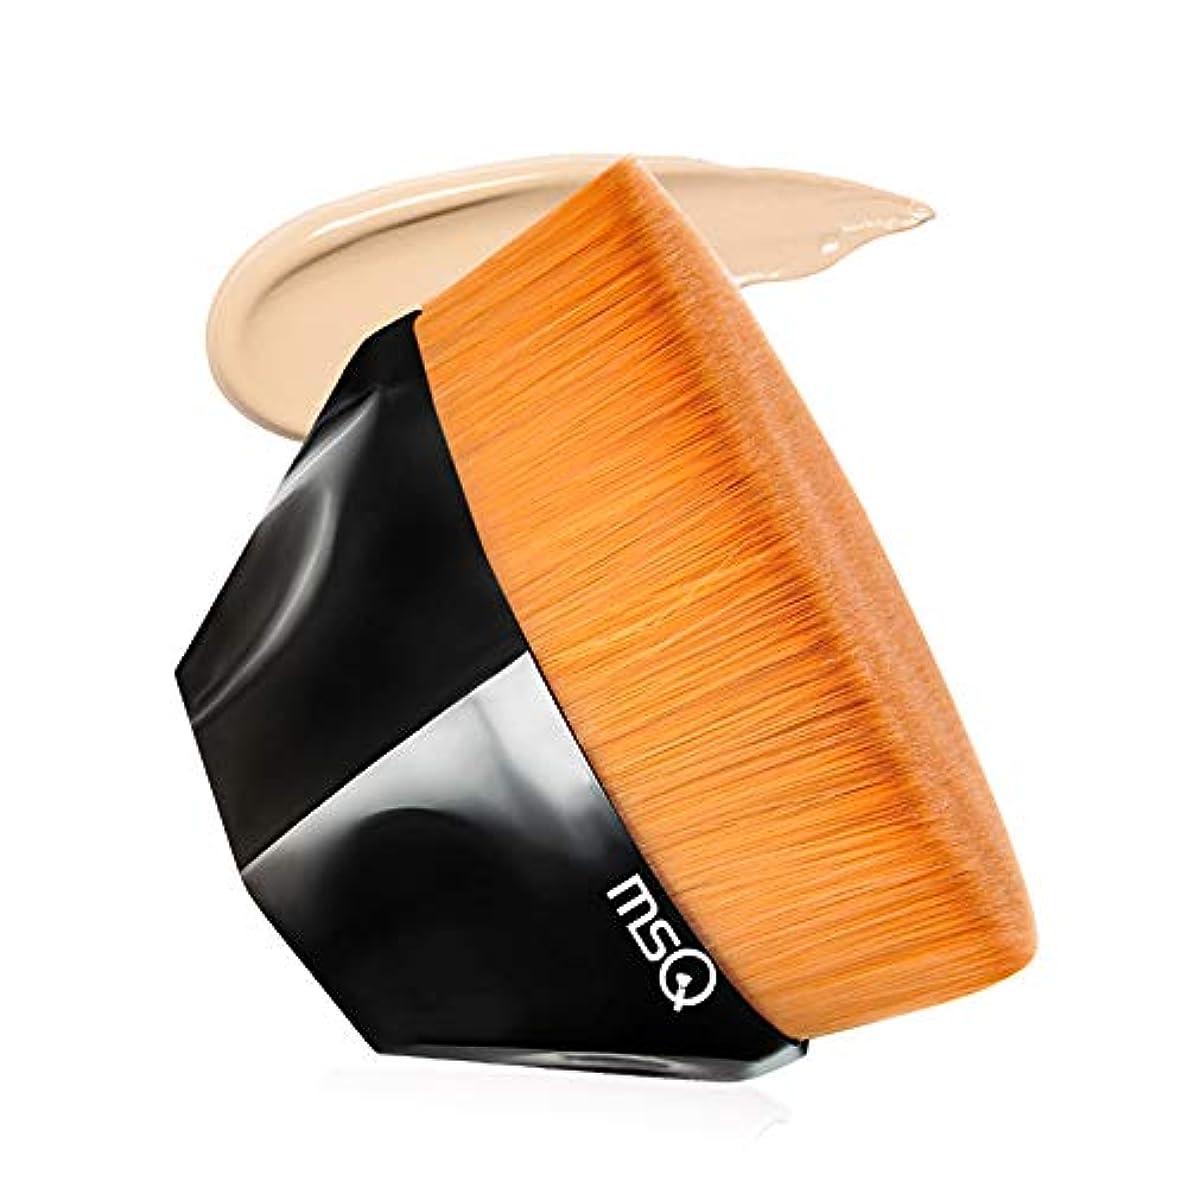 MSQ 化粧ブラシ 人気 メイクブラシ メイクアップブラシ 粧ブラシ 可愛い 化粧筆 肌に優しい ファンデーションブラシ アイシャドウブラシ 携帯便利